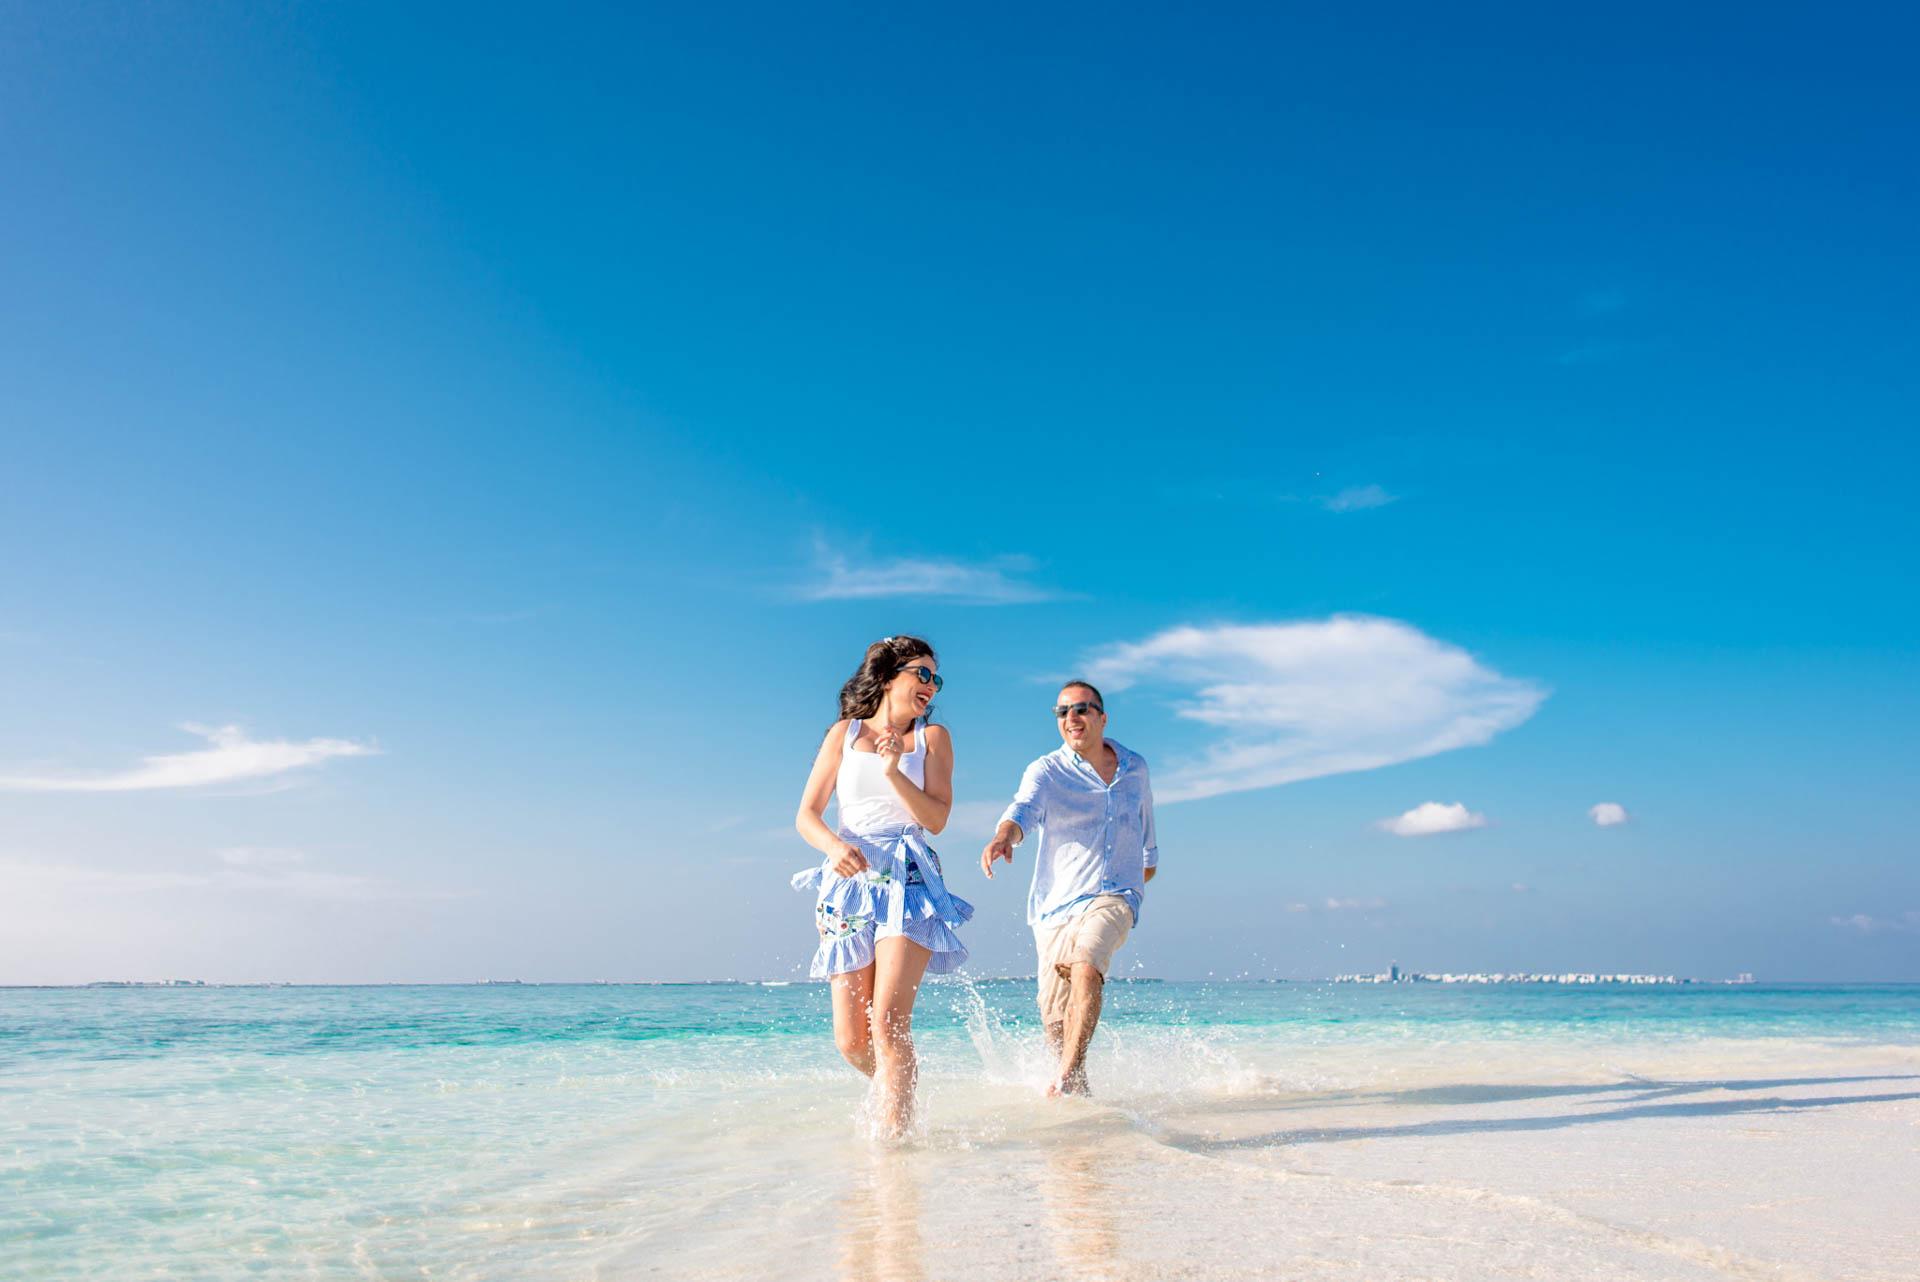 Shaidha Anthony at Vadoo Island Maldives 18